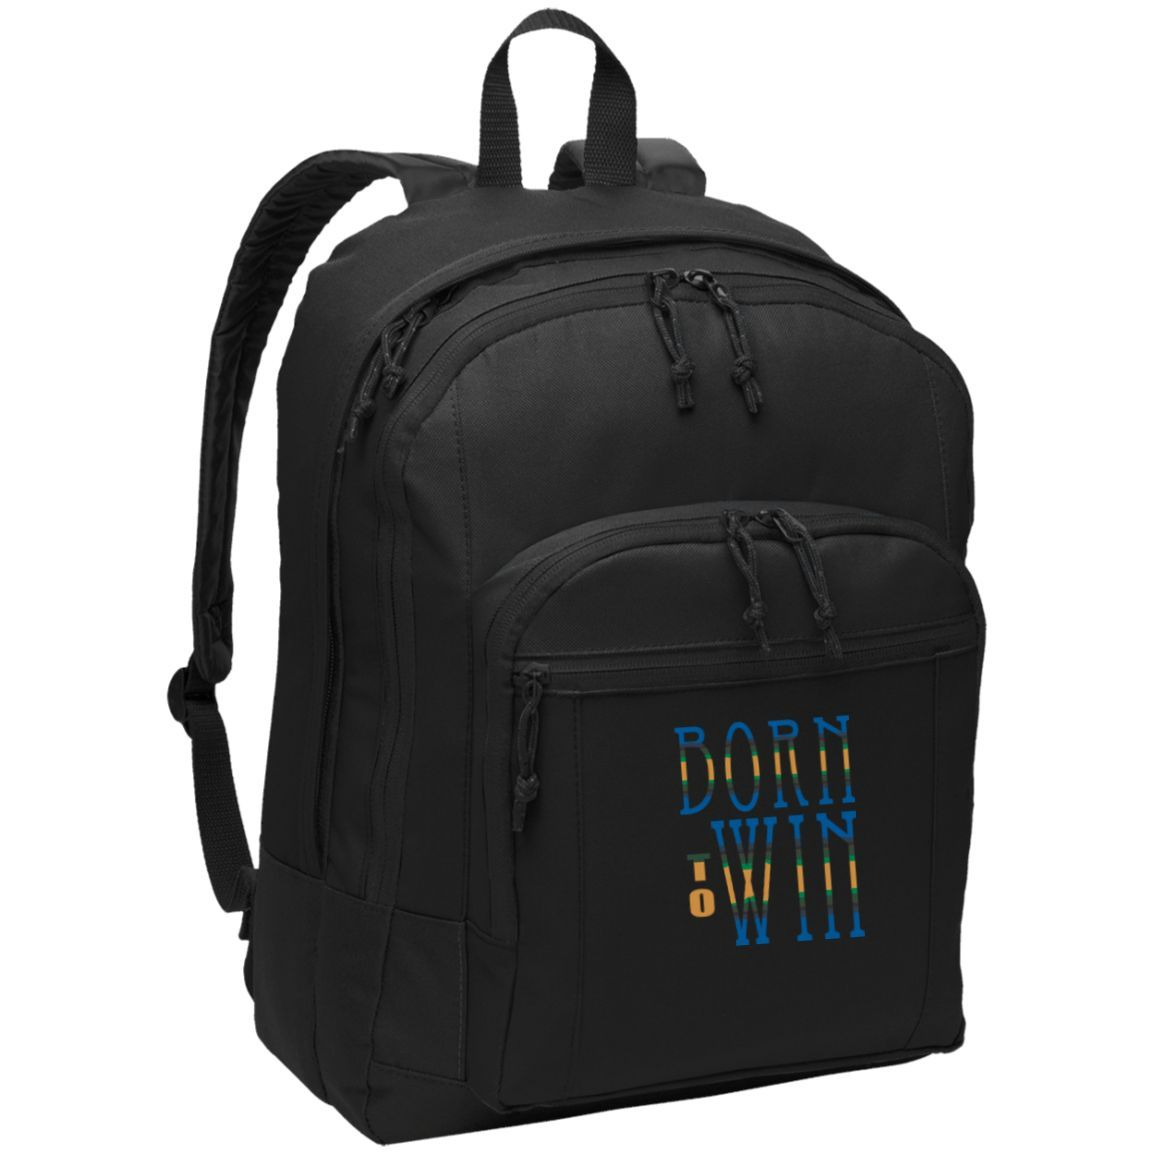 BORN TO WIN! Basic Backpack – WAM Shopping